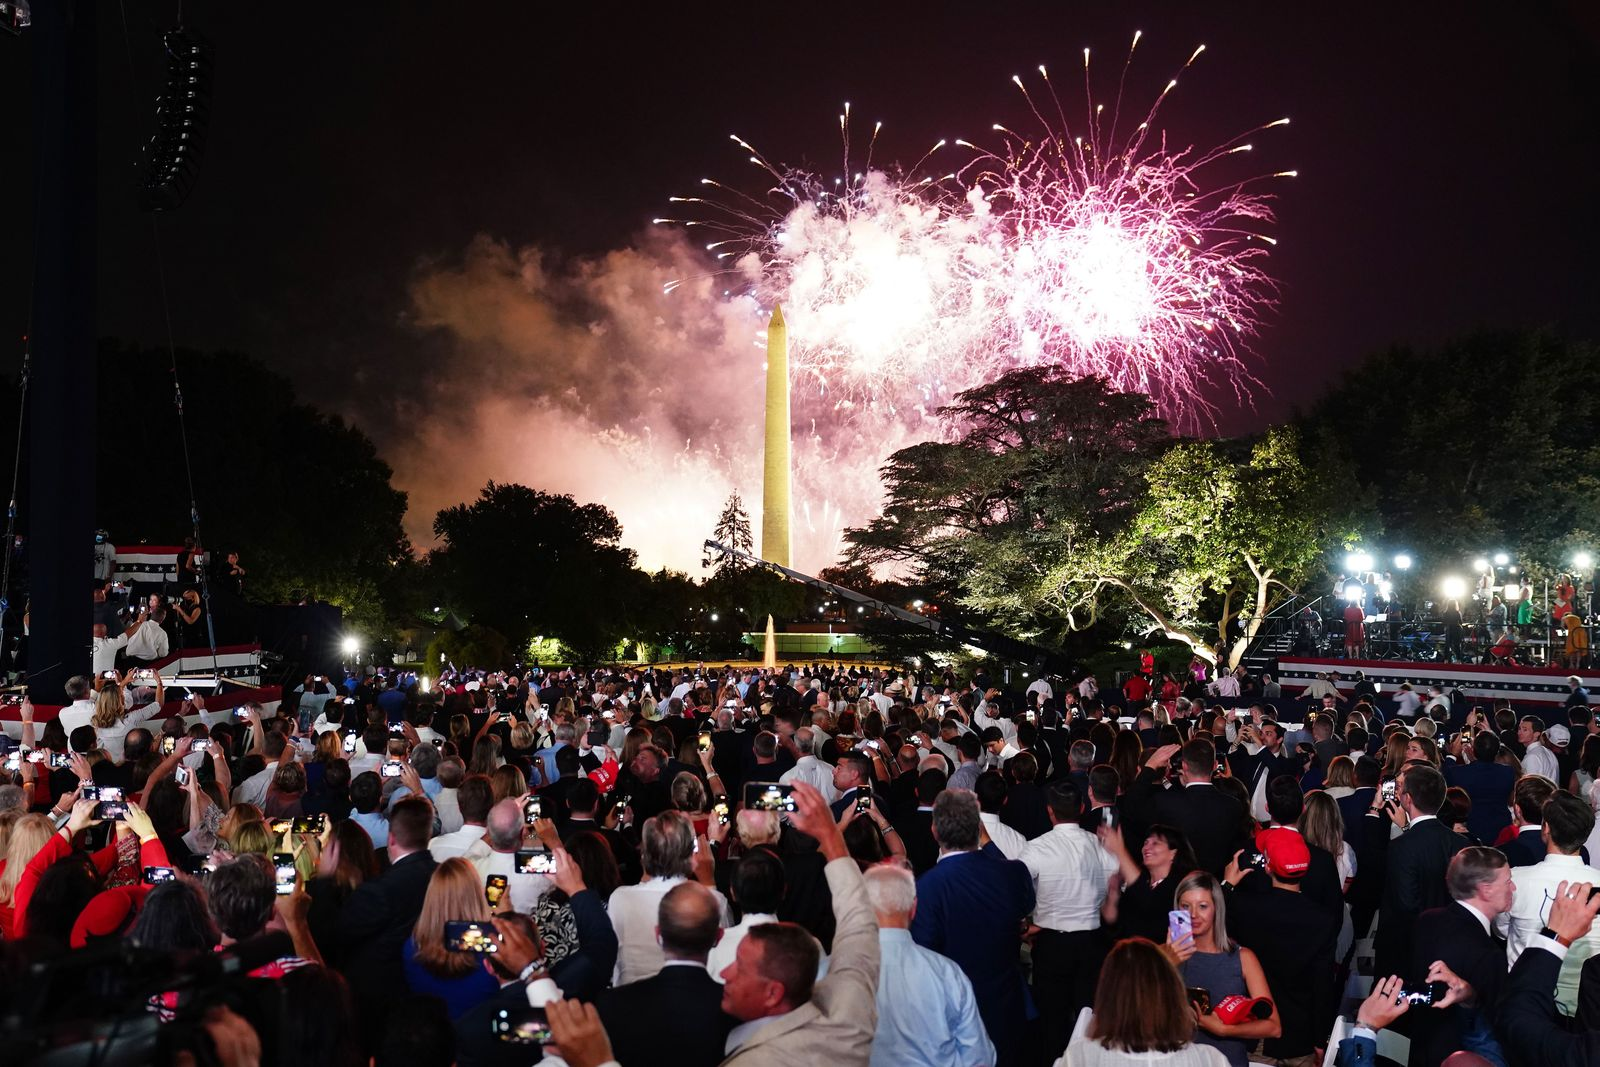 Republican National Convention, Washington, USA - 27 Aug 2020